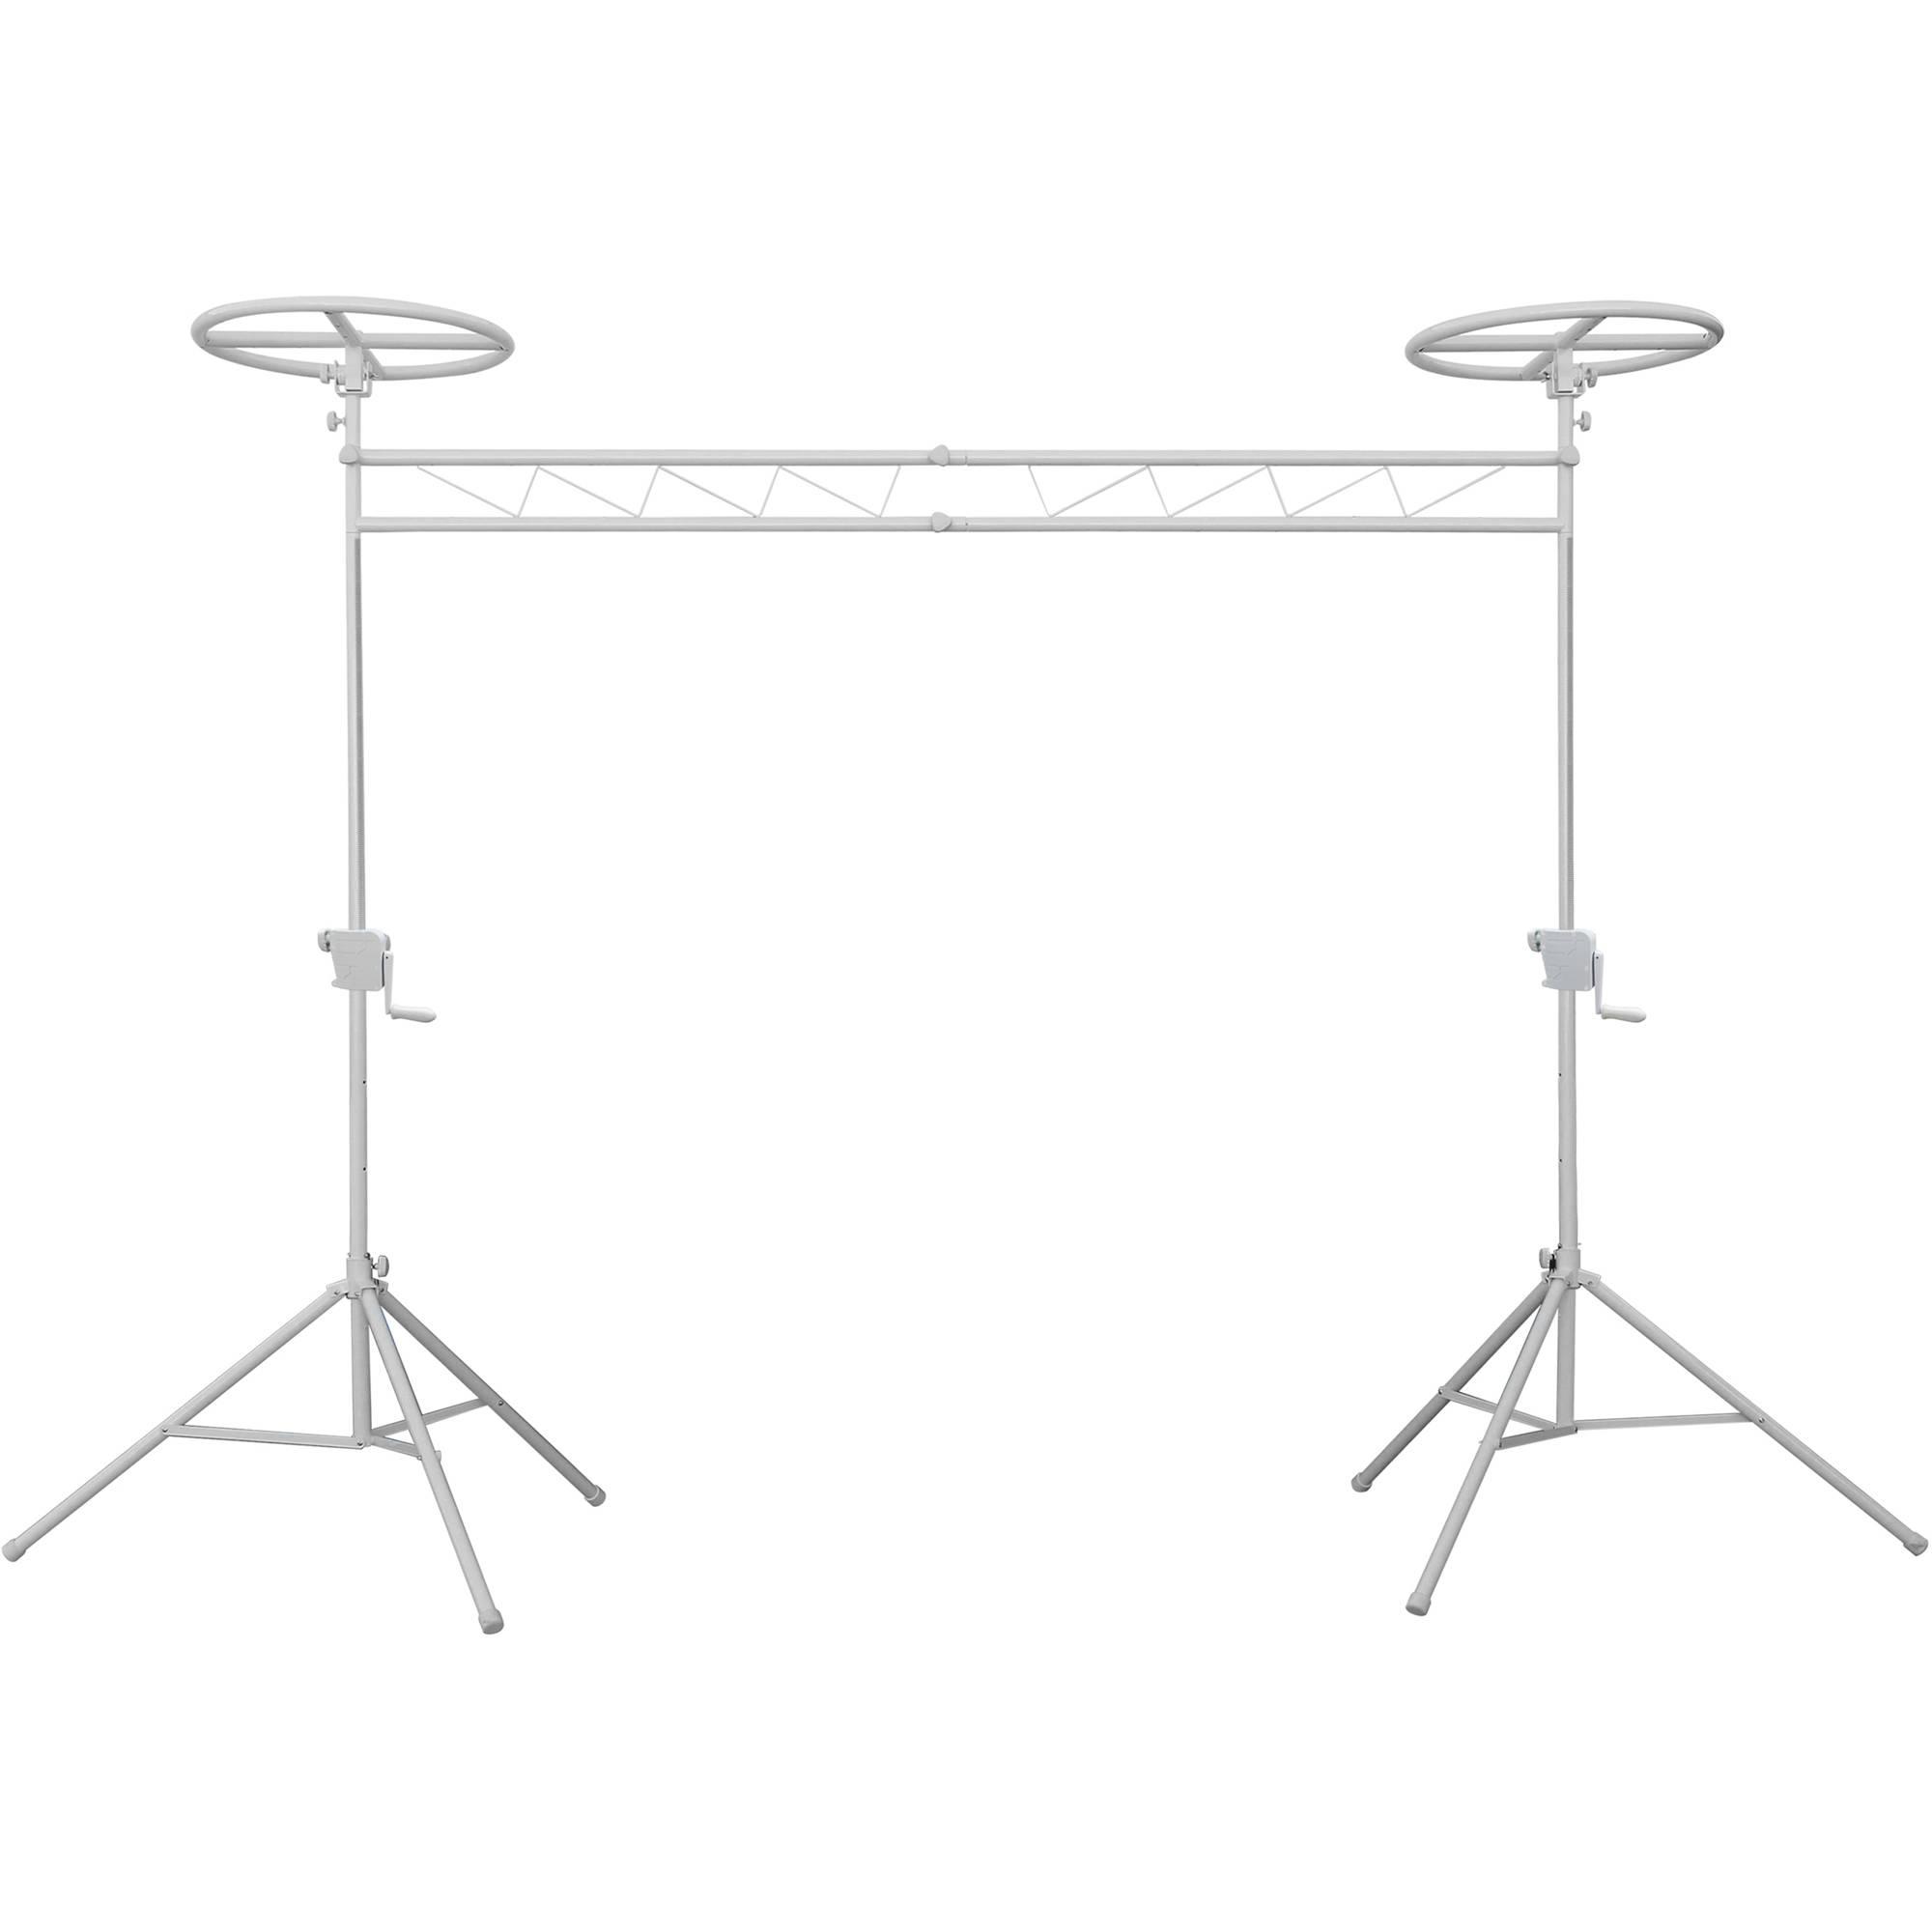 event dj product speaker system detail truss lighting portable buy for